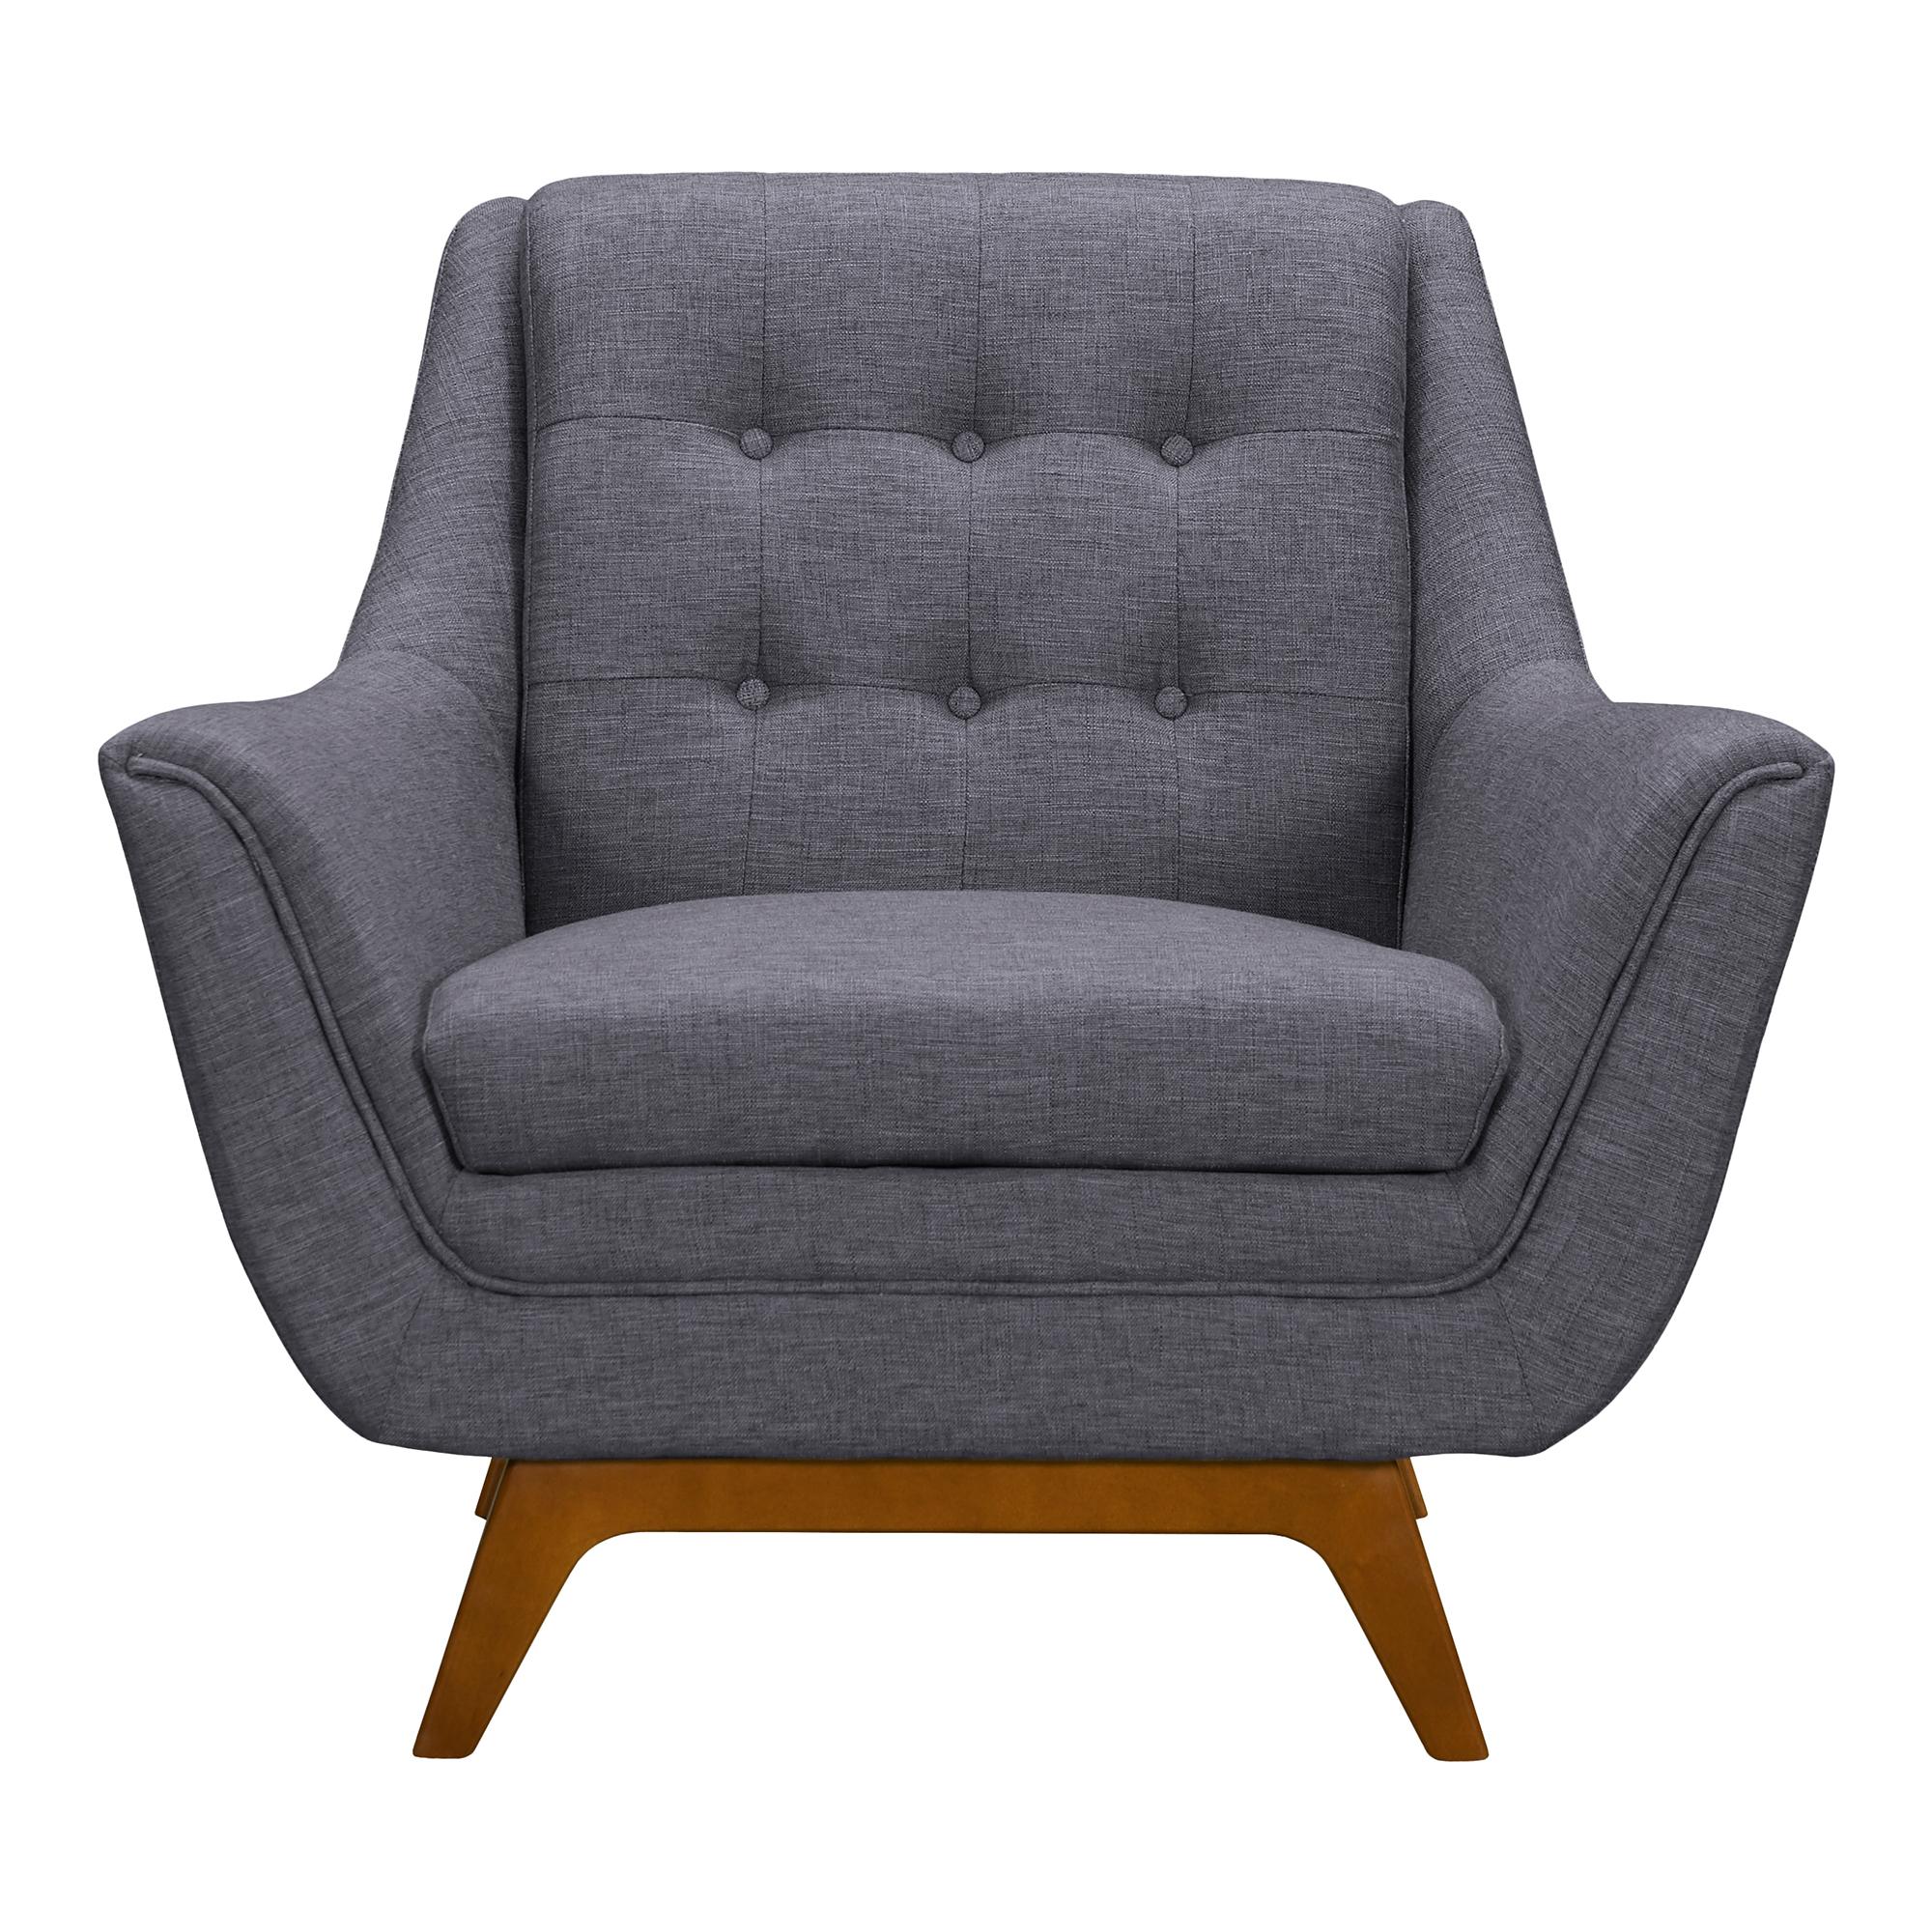 Janson Mid-Century Sofa Chair in Champagne WoodFinish and Dark Grey Fabric